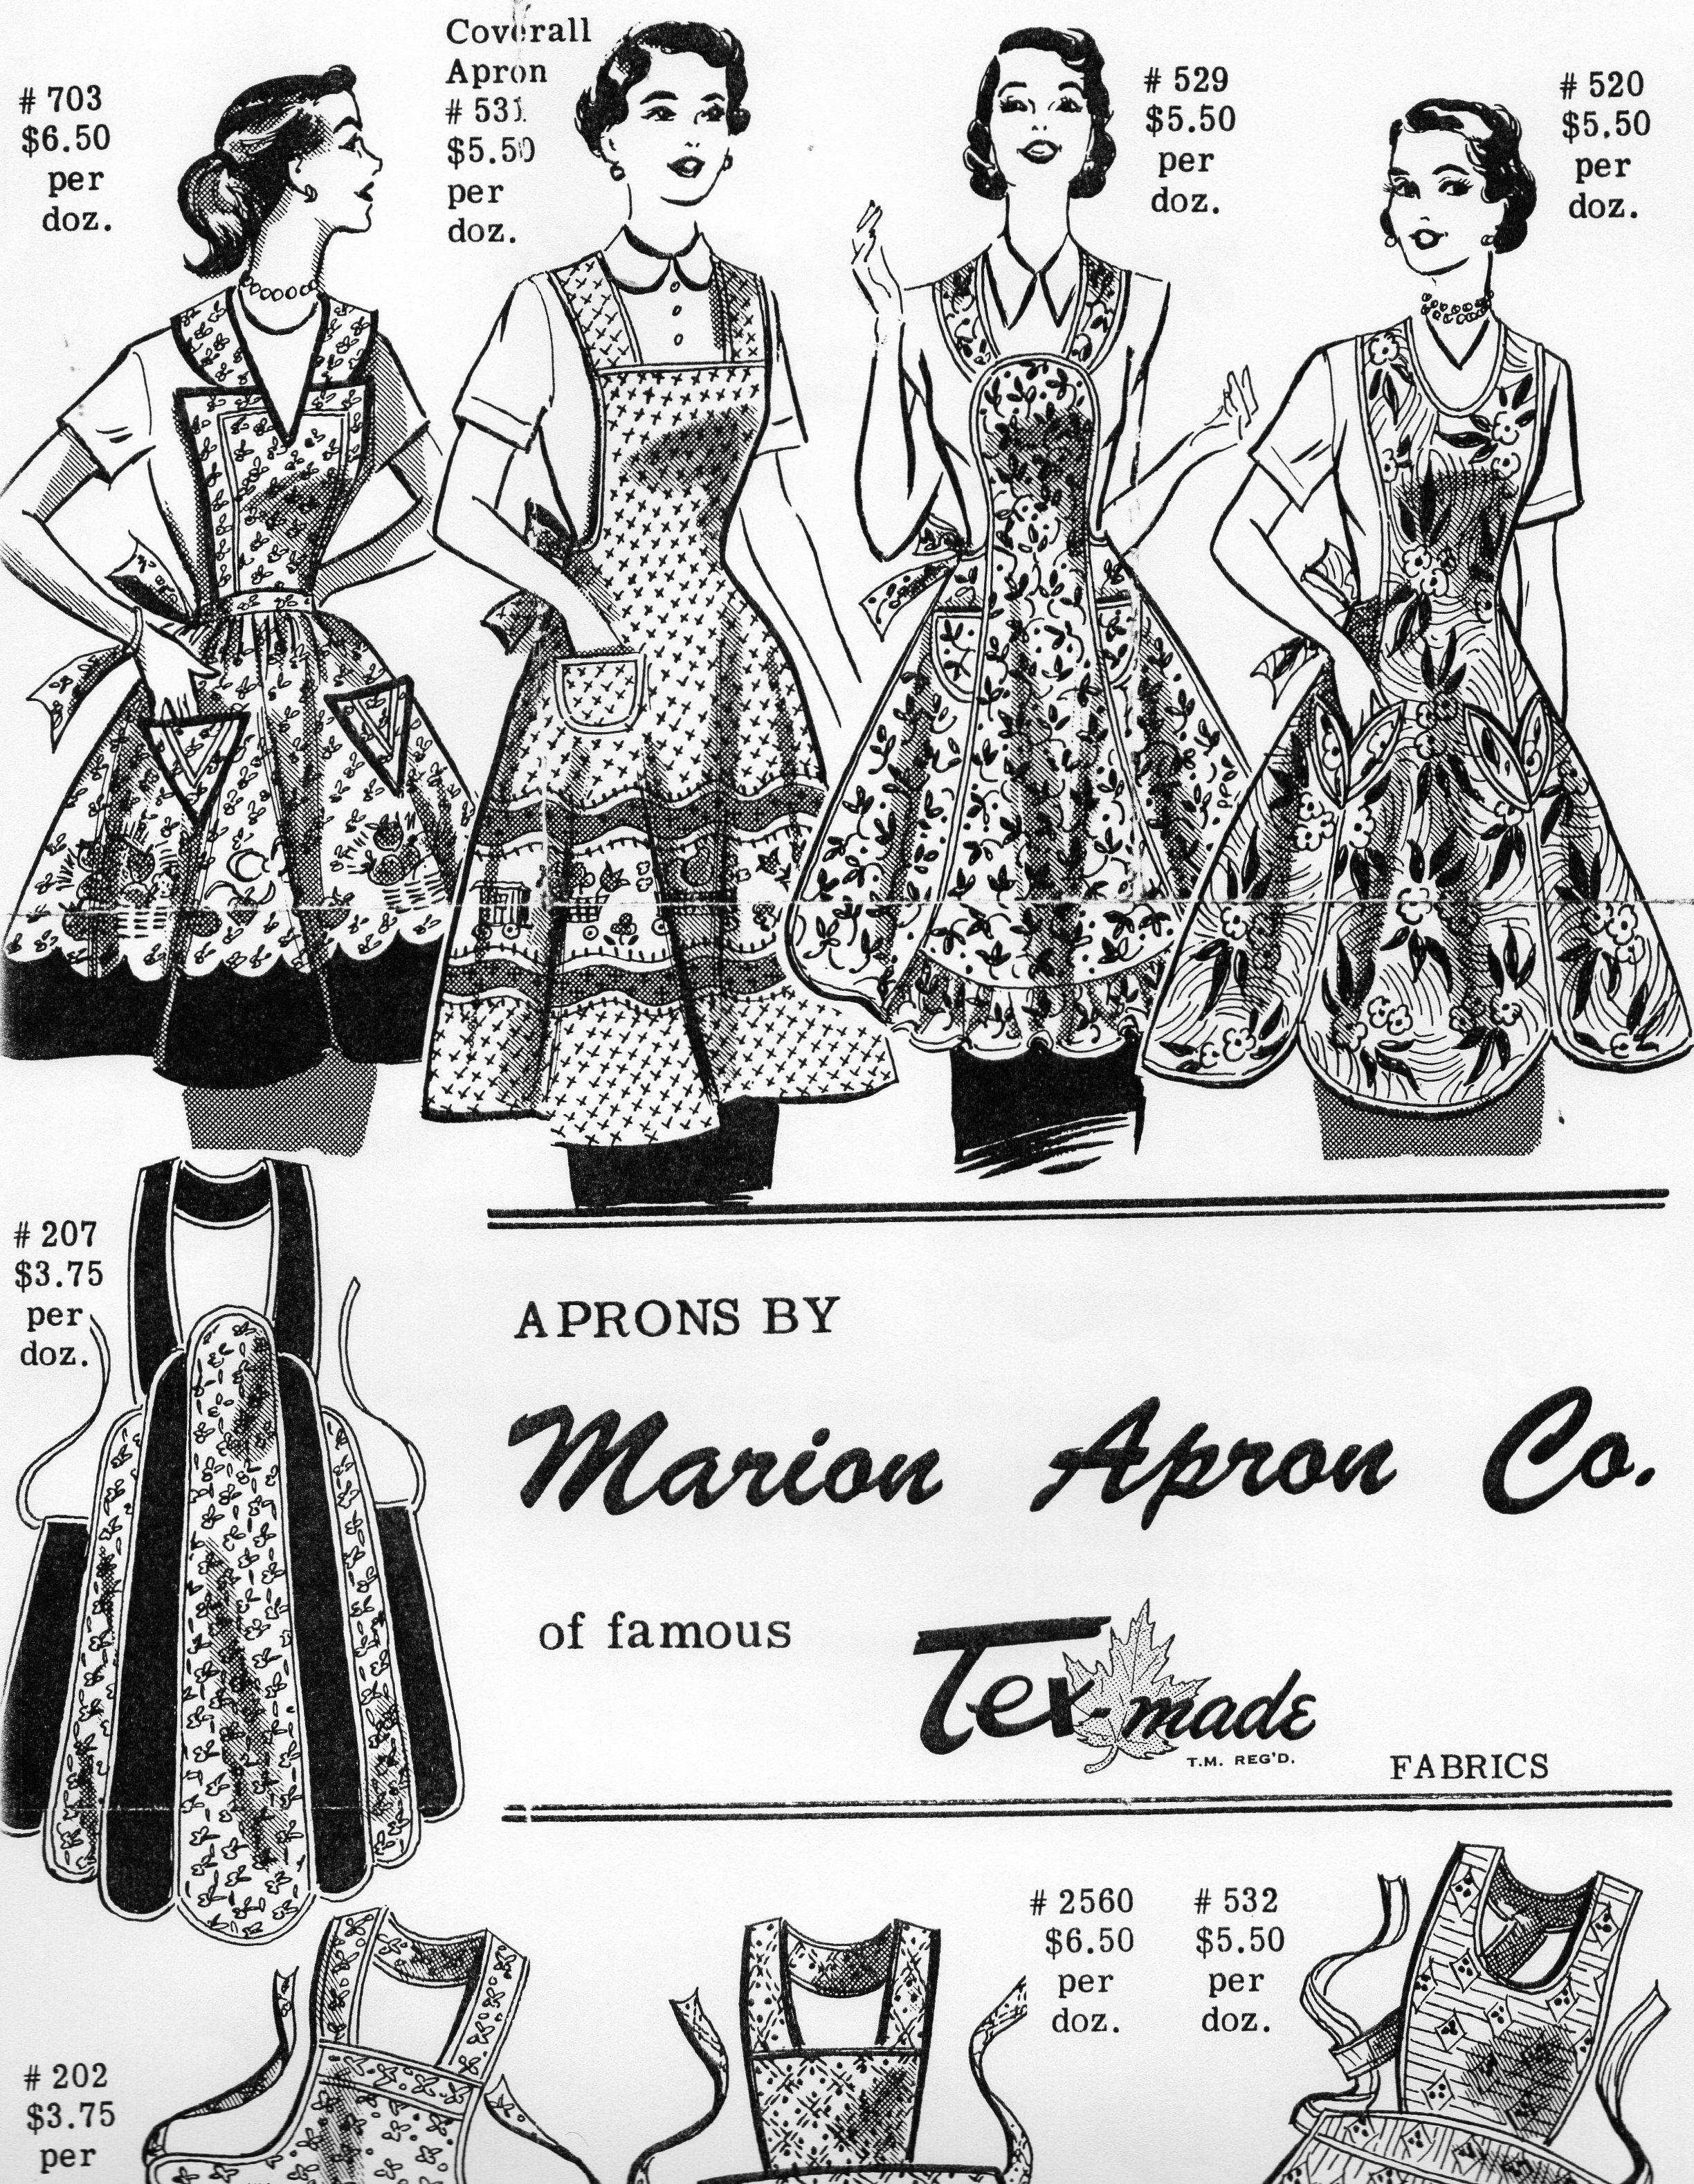 White apron canada - Apron Factory Montreal Quebec Canada 1940 S 1950 S